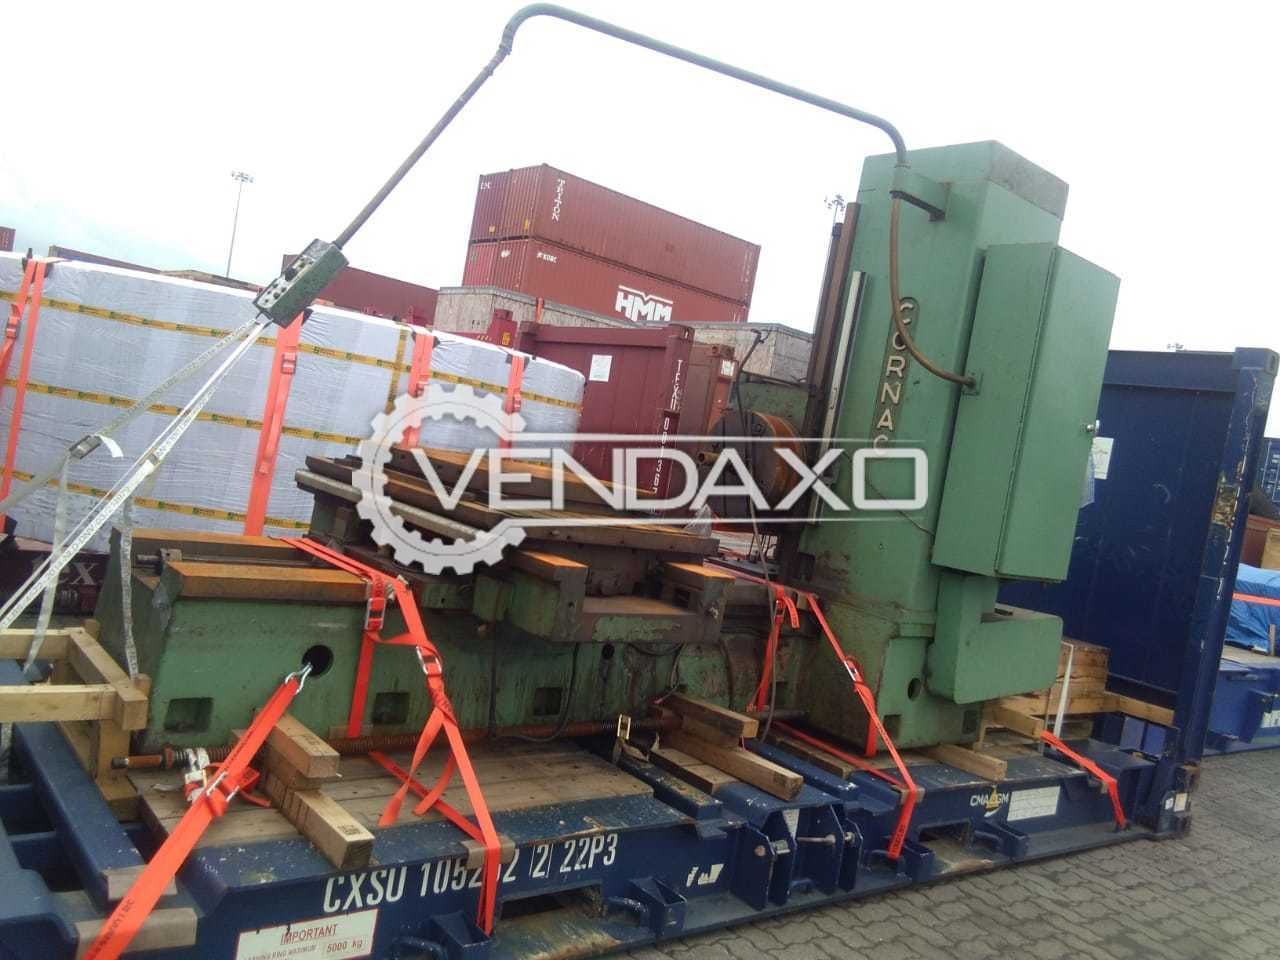 Cornac C100 Horizontal Boring And Milling Machine - Table Size : 1420 x 980 mm